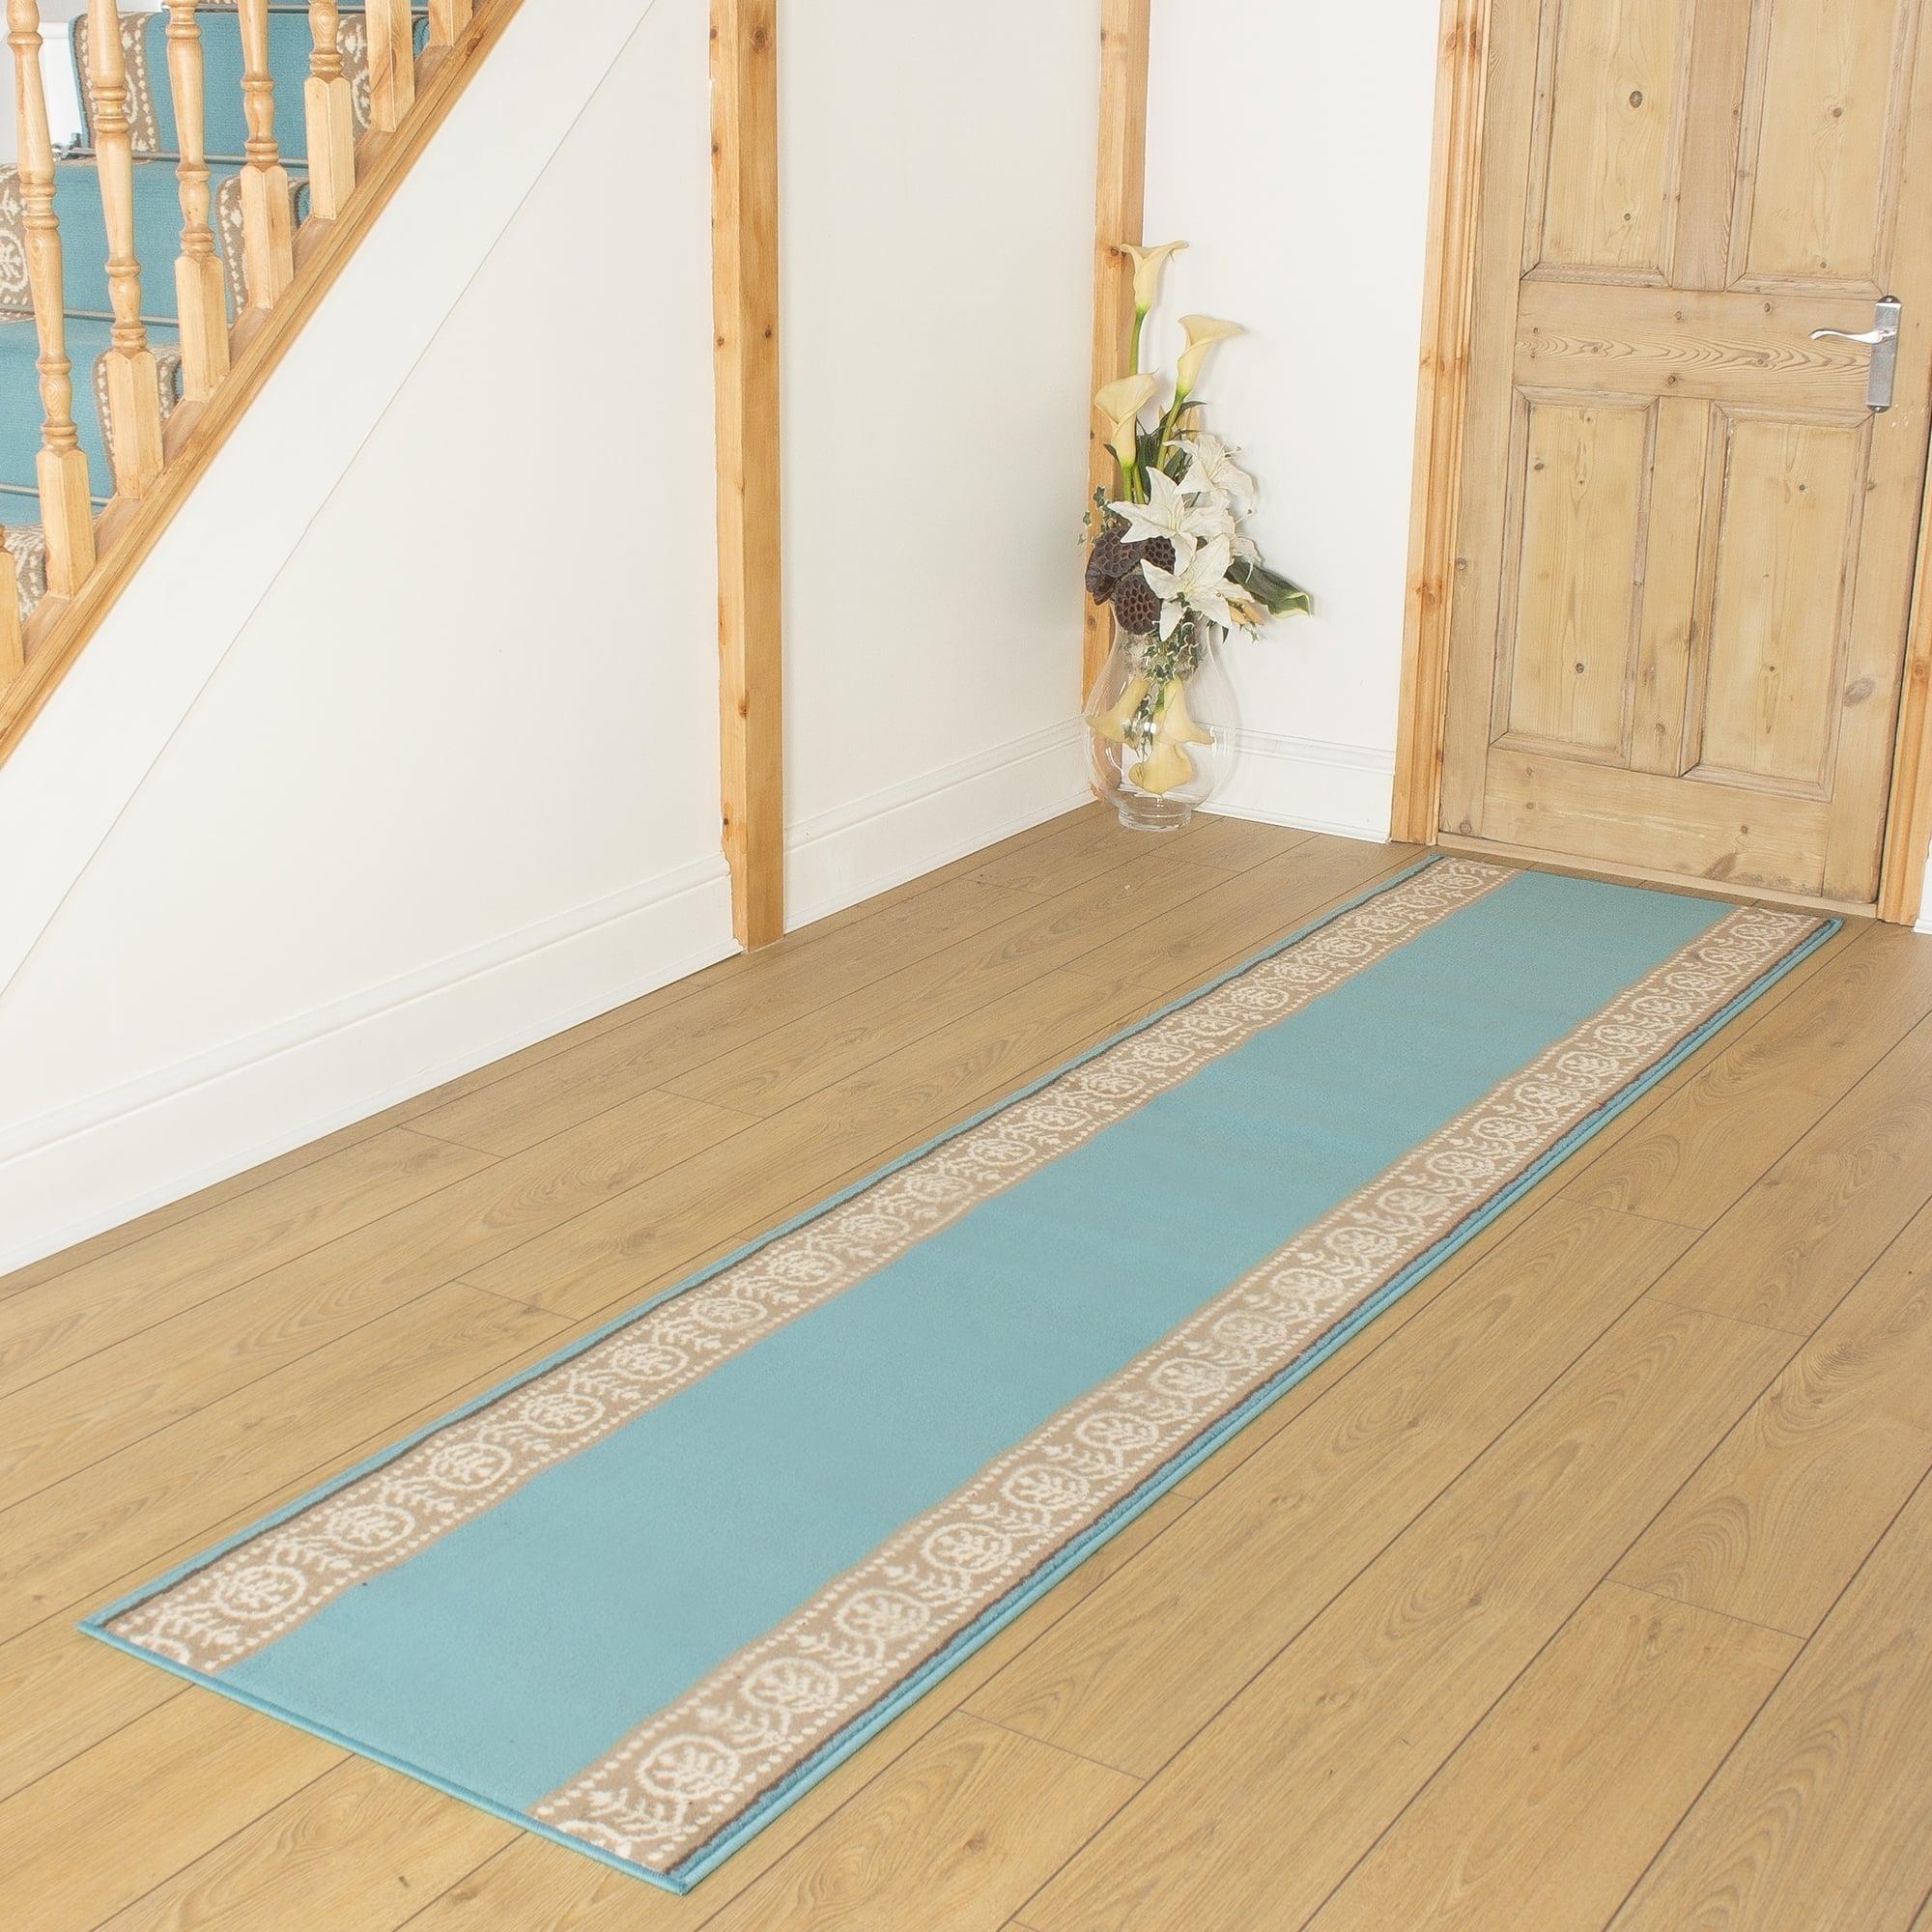 Motif Blue Hallway Runner Remnant Length 210cm 6ft 11in X Width 70cm 2ft 4in